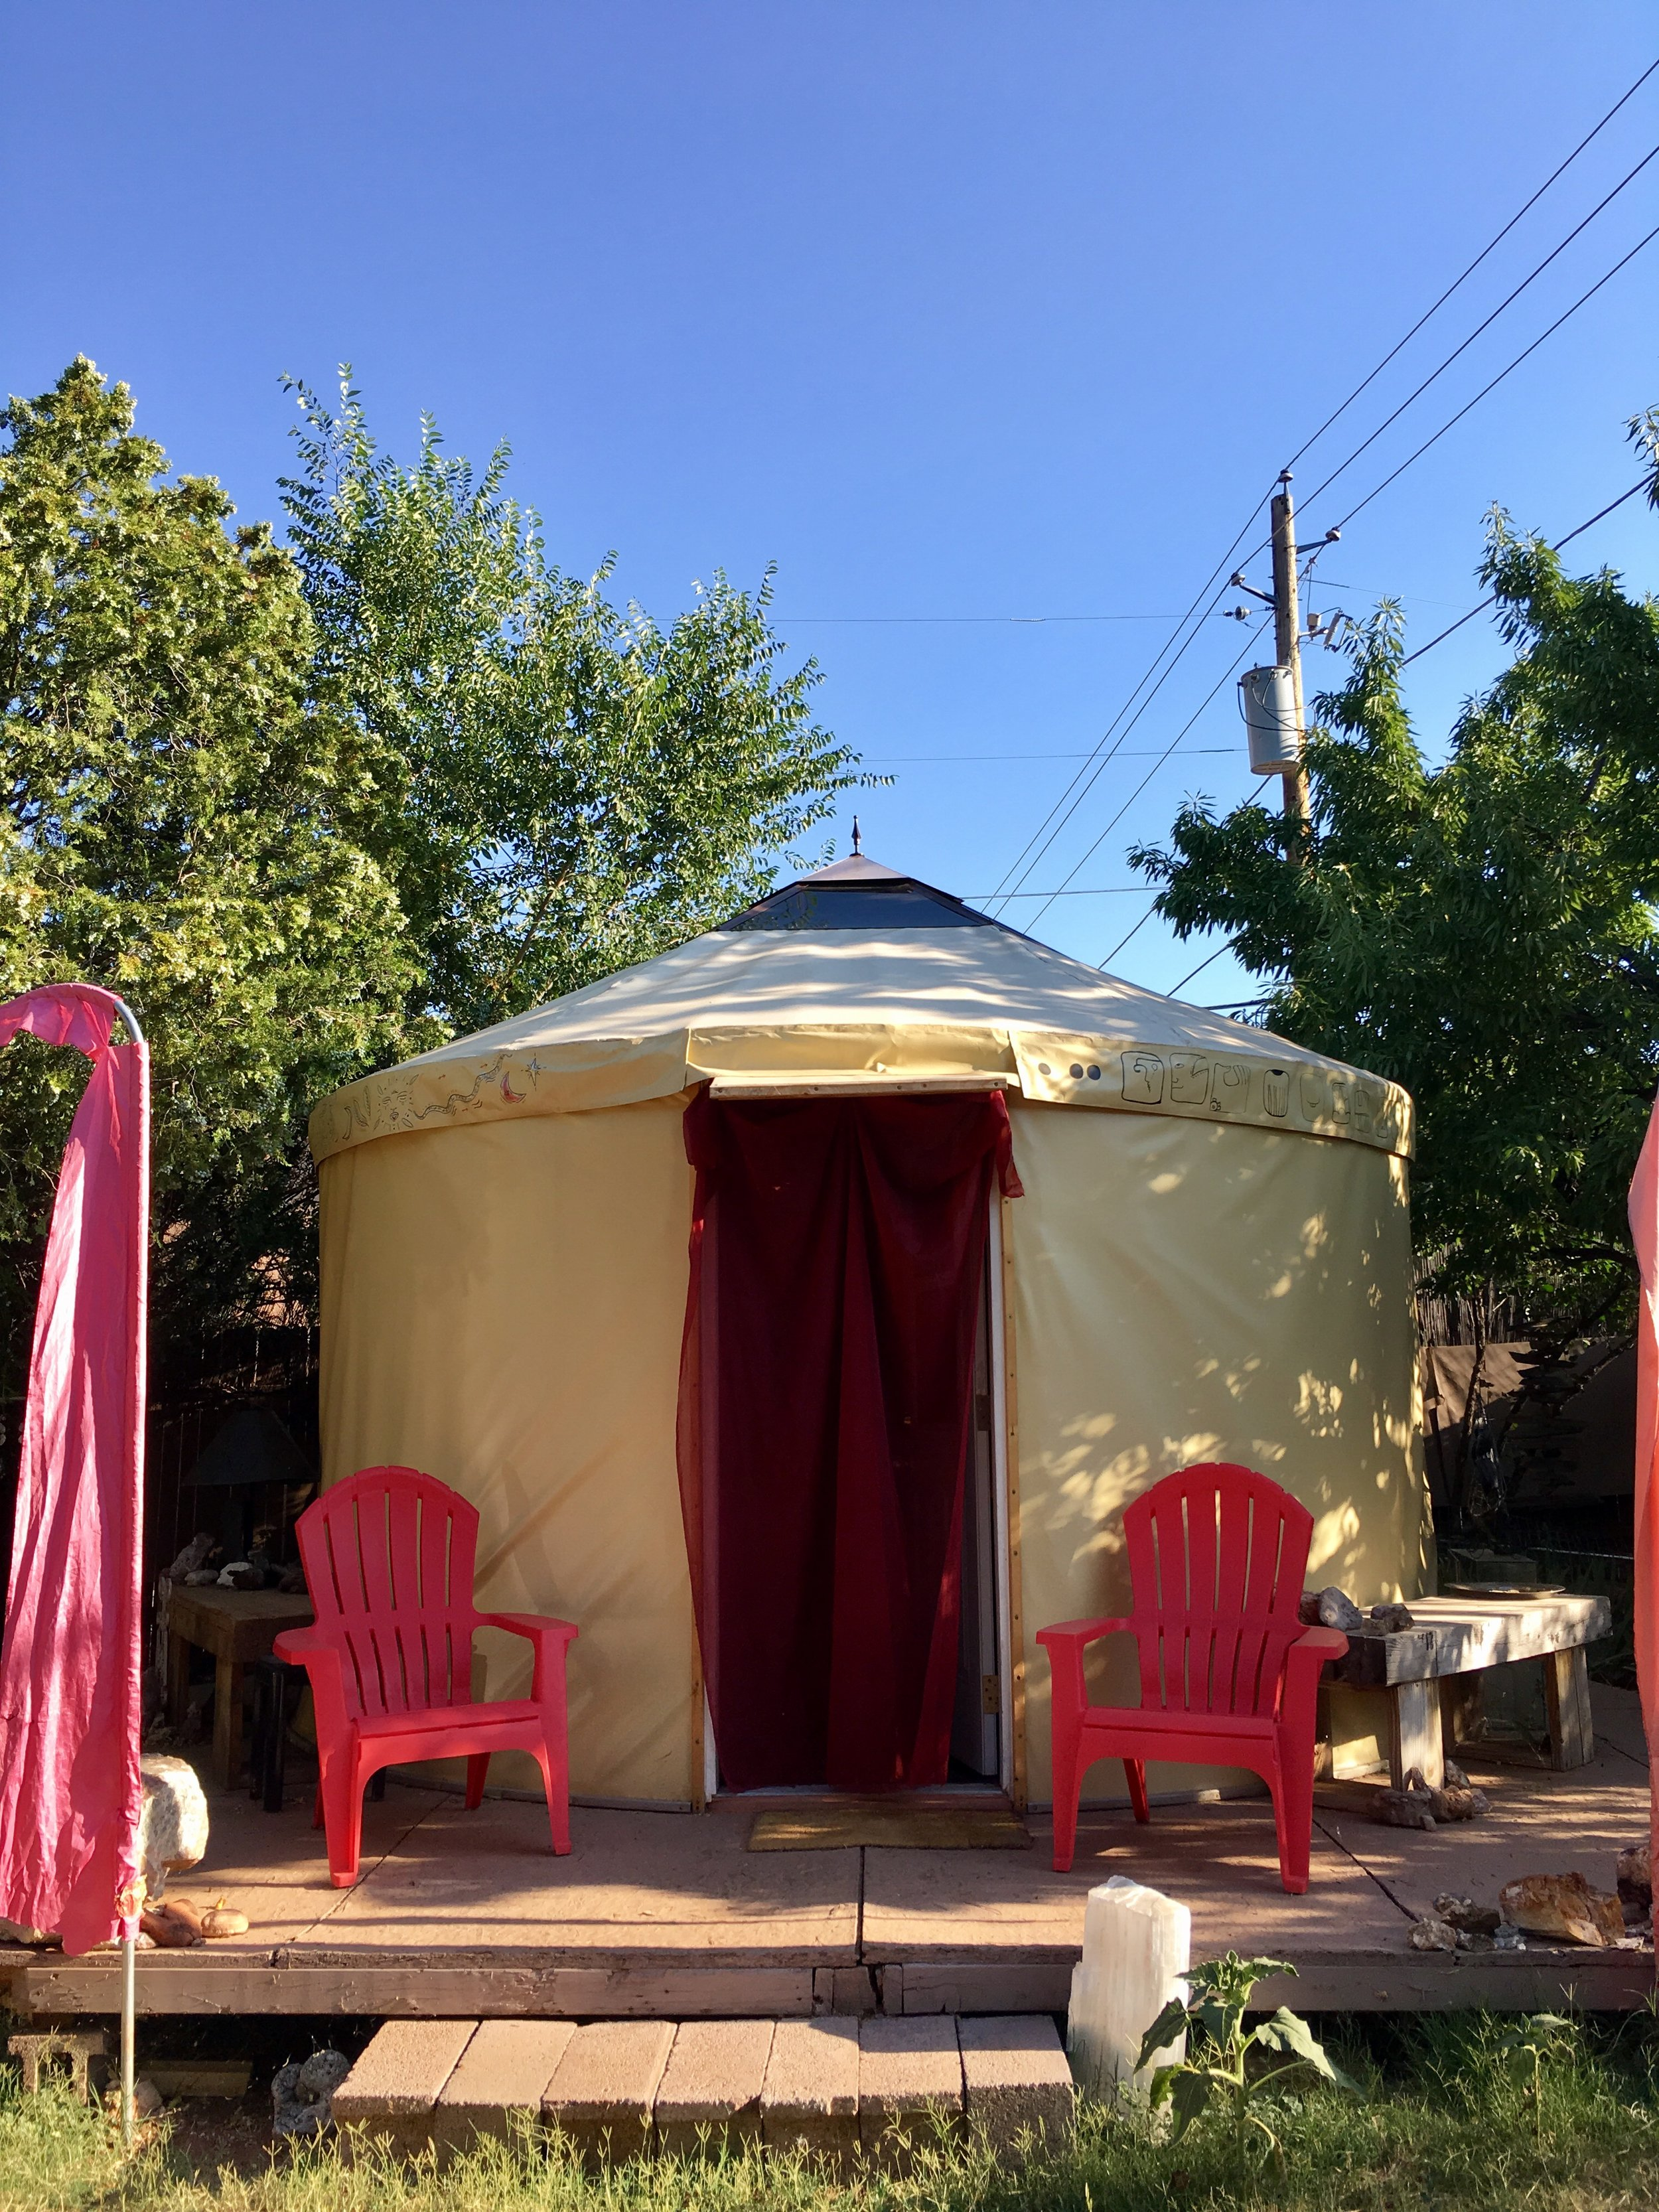 Airbnb in Sedona ~ The Yurt.